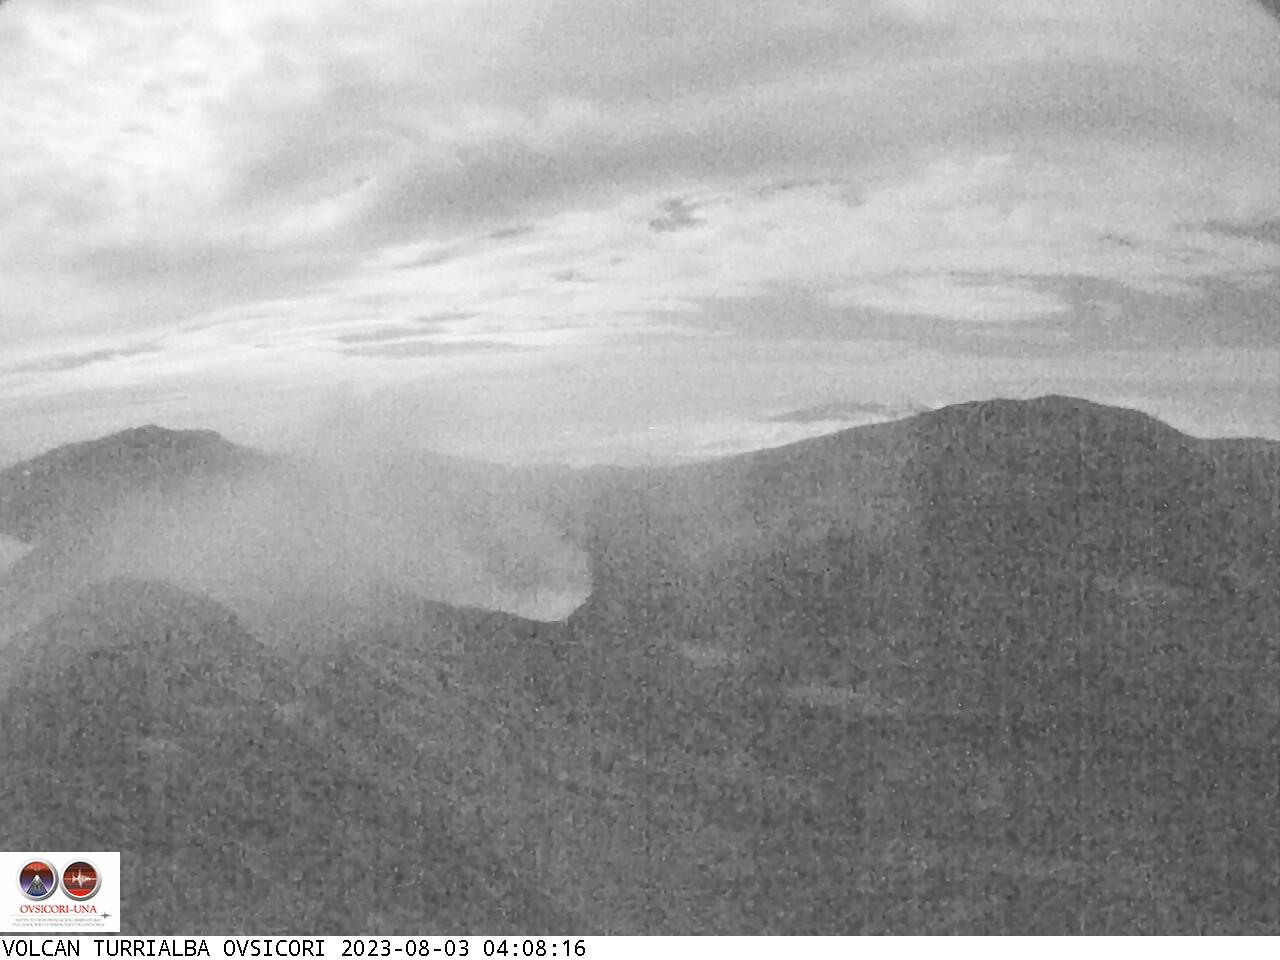 Volcano Turrialba Sun. 04:08